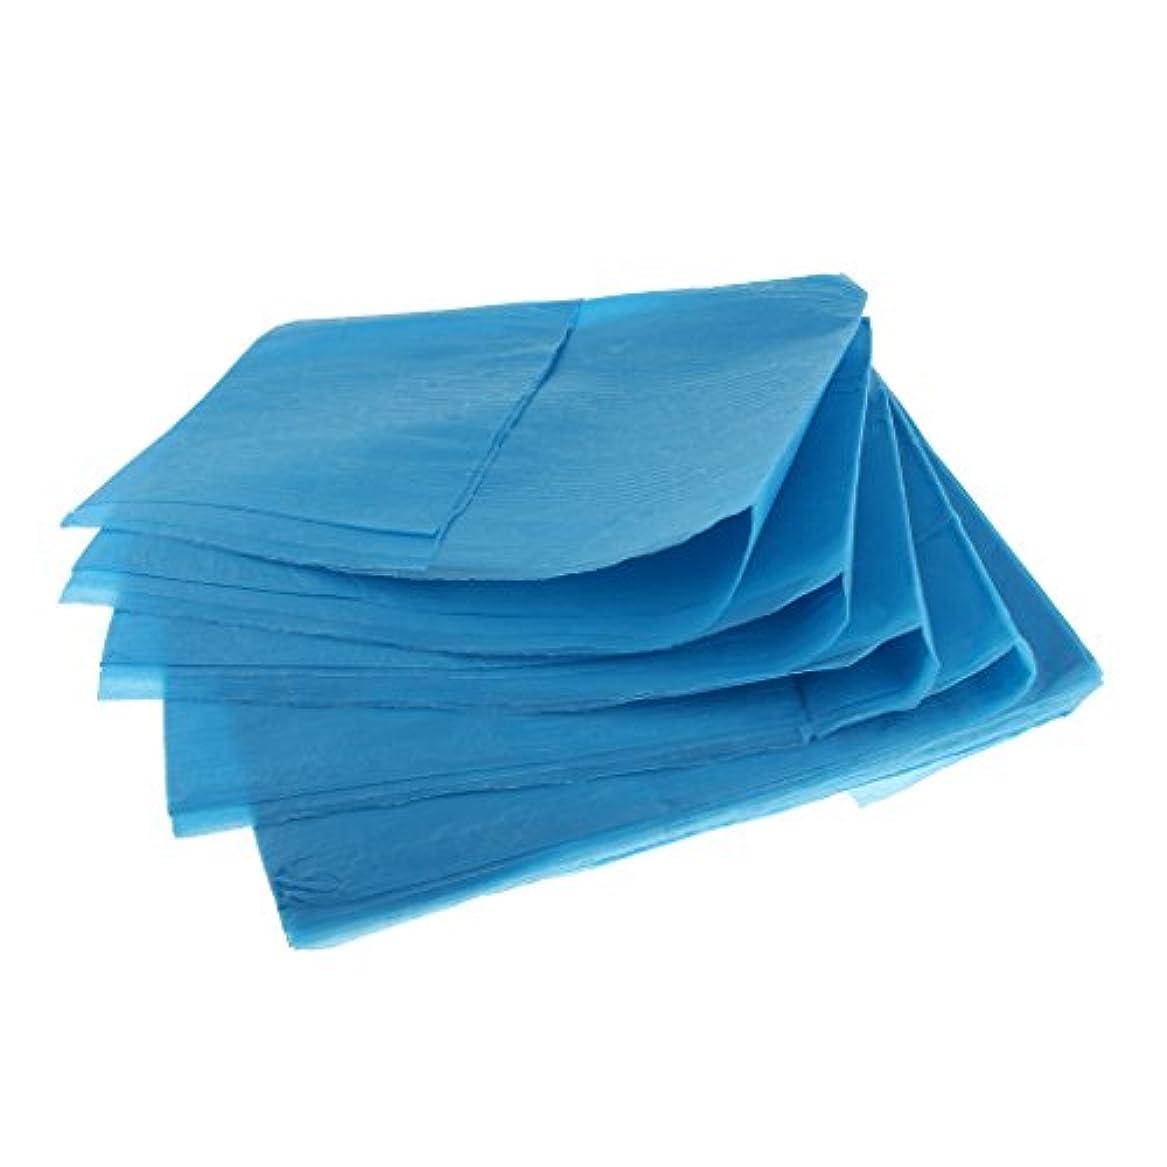 SONONIA 10枚 使い捨て ベッドシーツ ベッドパッド カバー 妊産婦 生理期間 スキンケア 美容院 サロン ホテル 2色選べ - 青